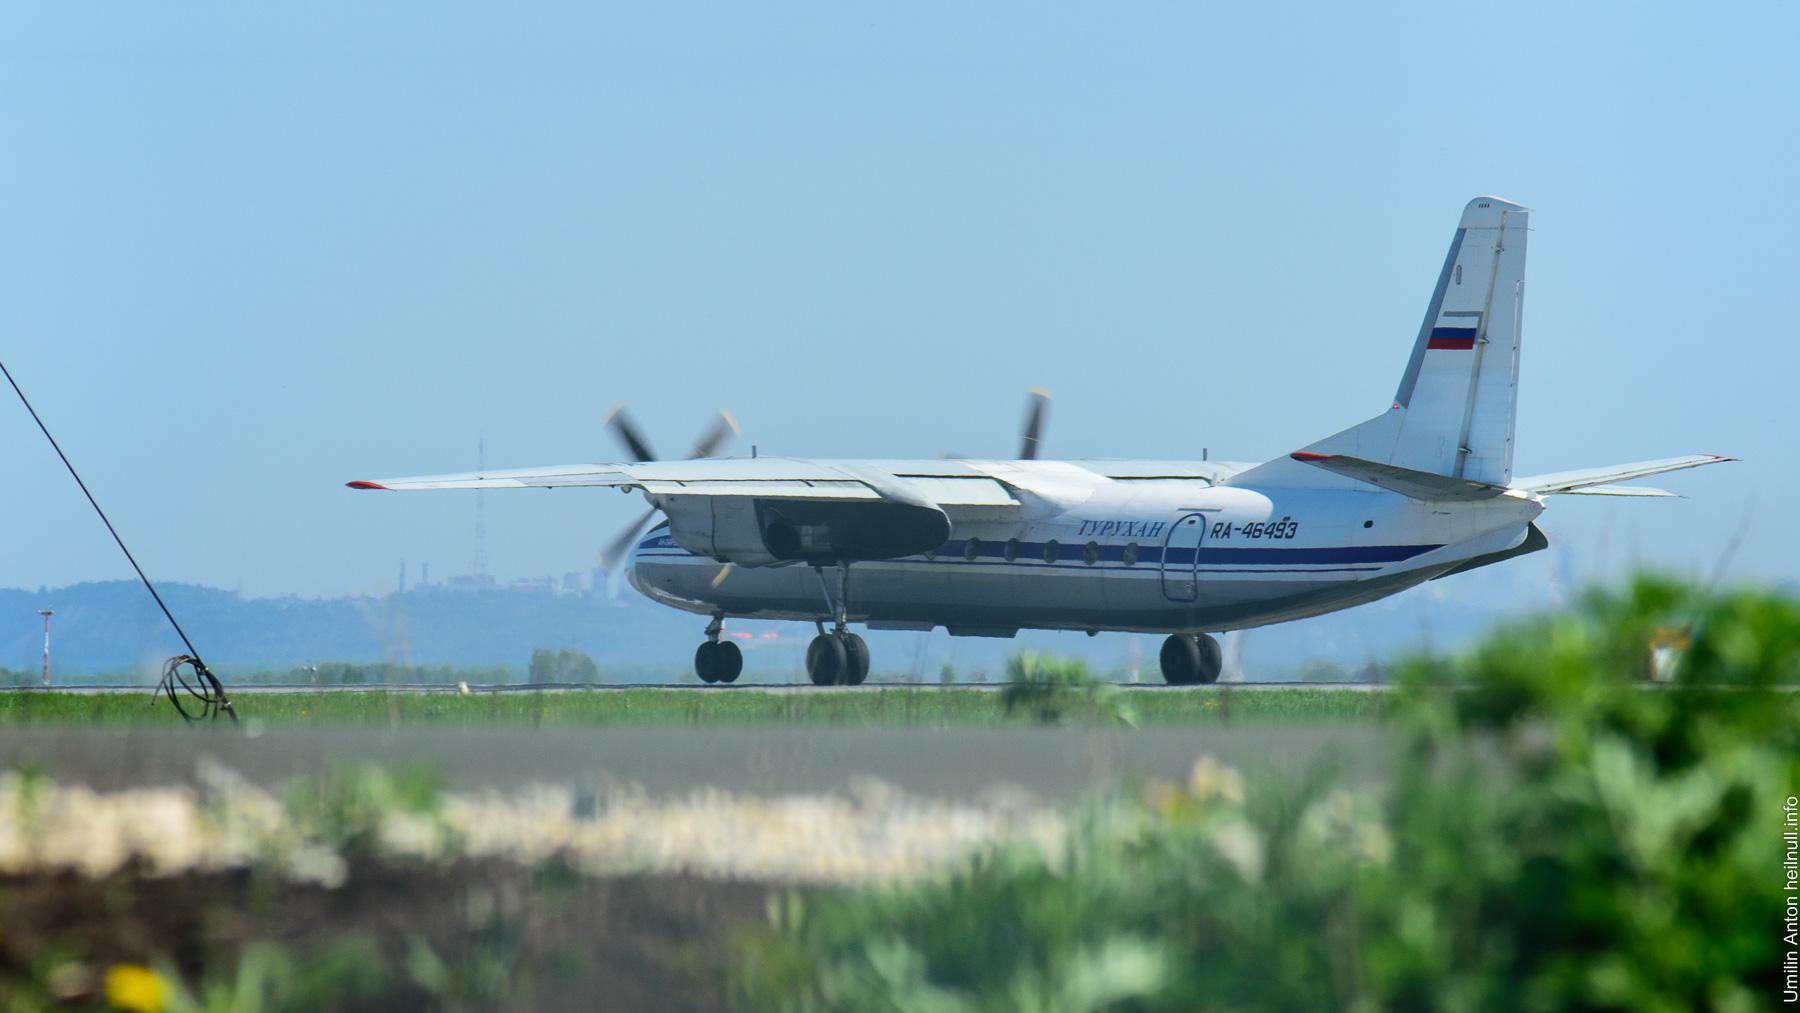 UAY_8111-7